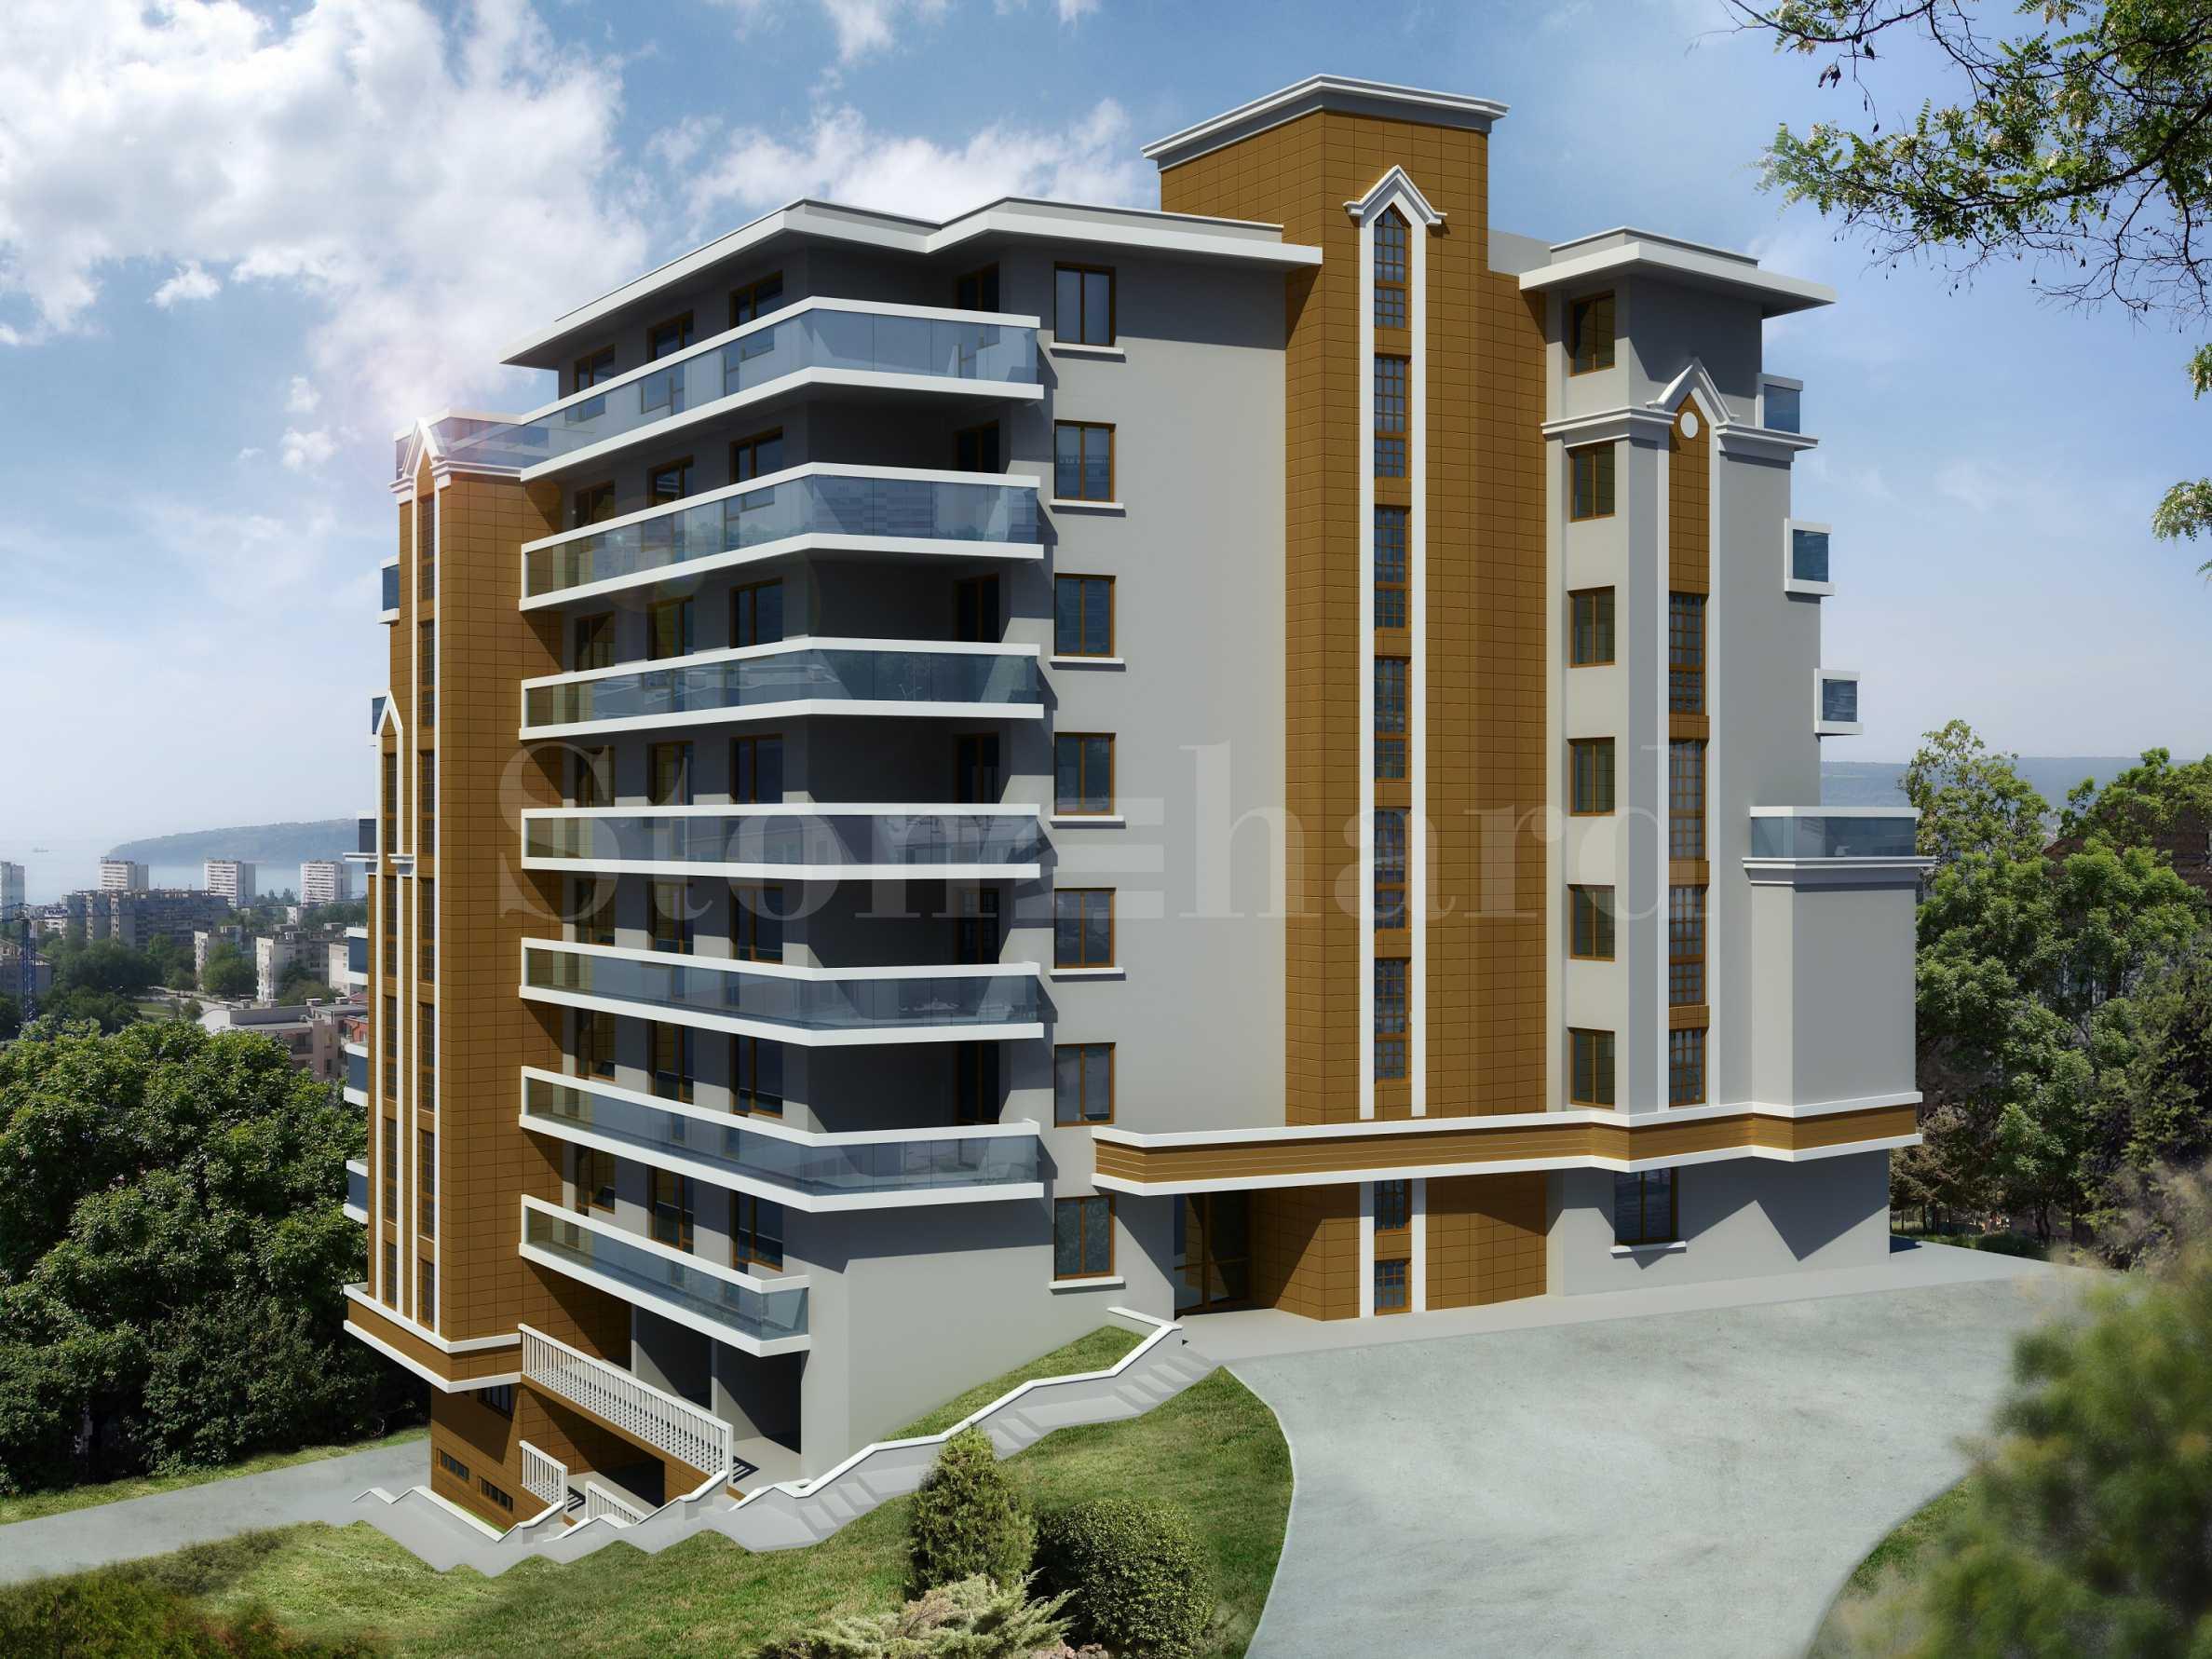 Stonehard Breeze Residence —нови апартаменти в кв. Бриз-юг, недалеч Морската градина2 - Stonehard